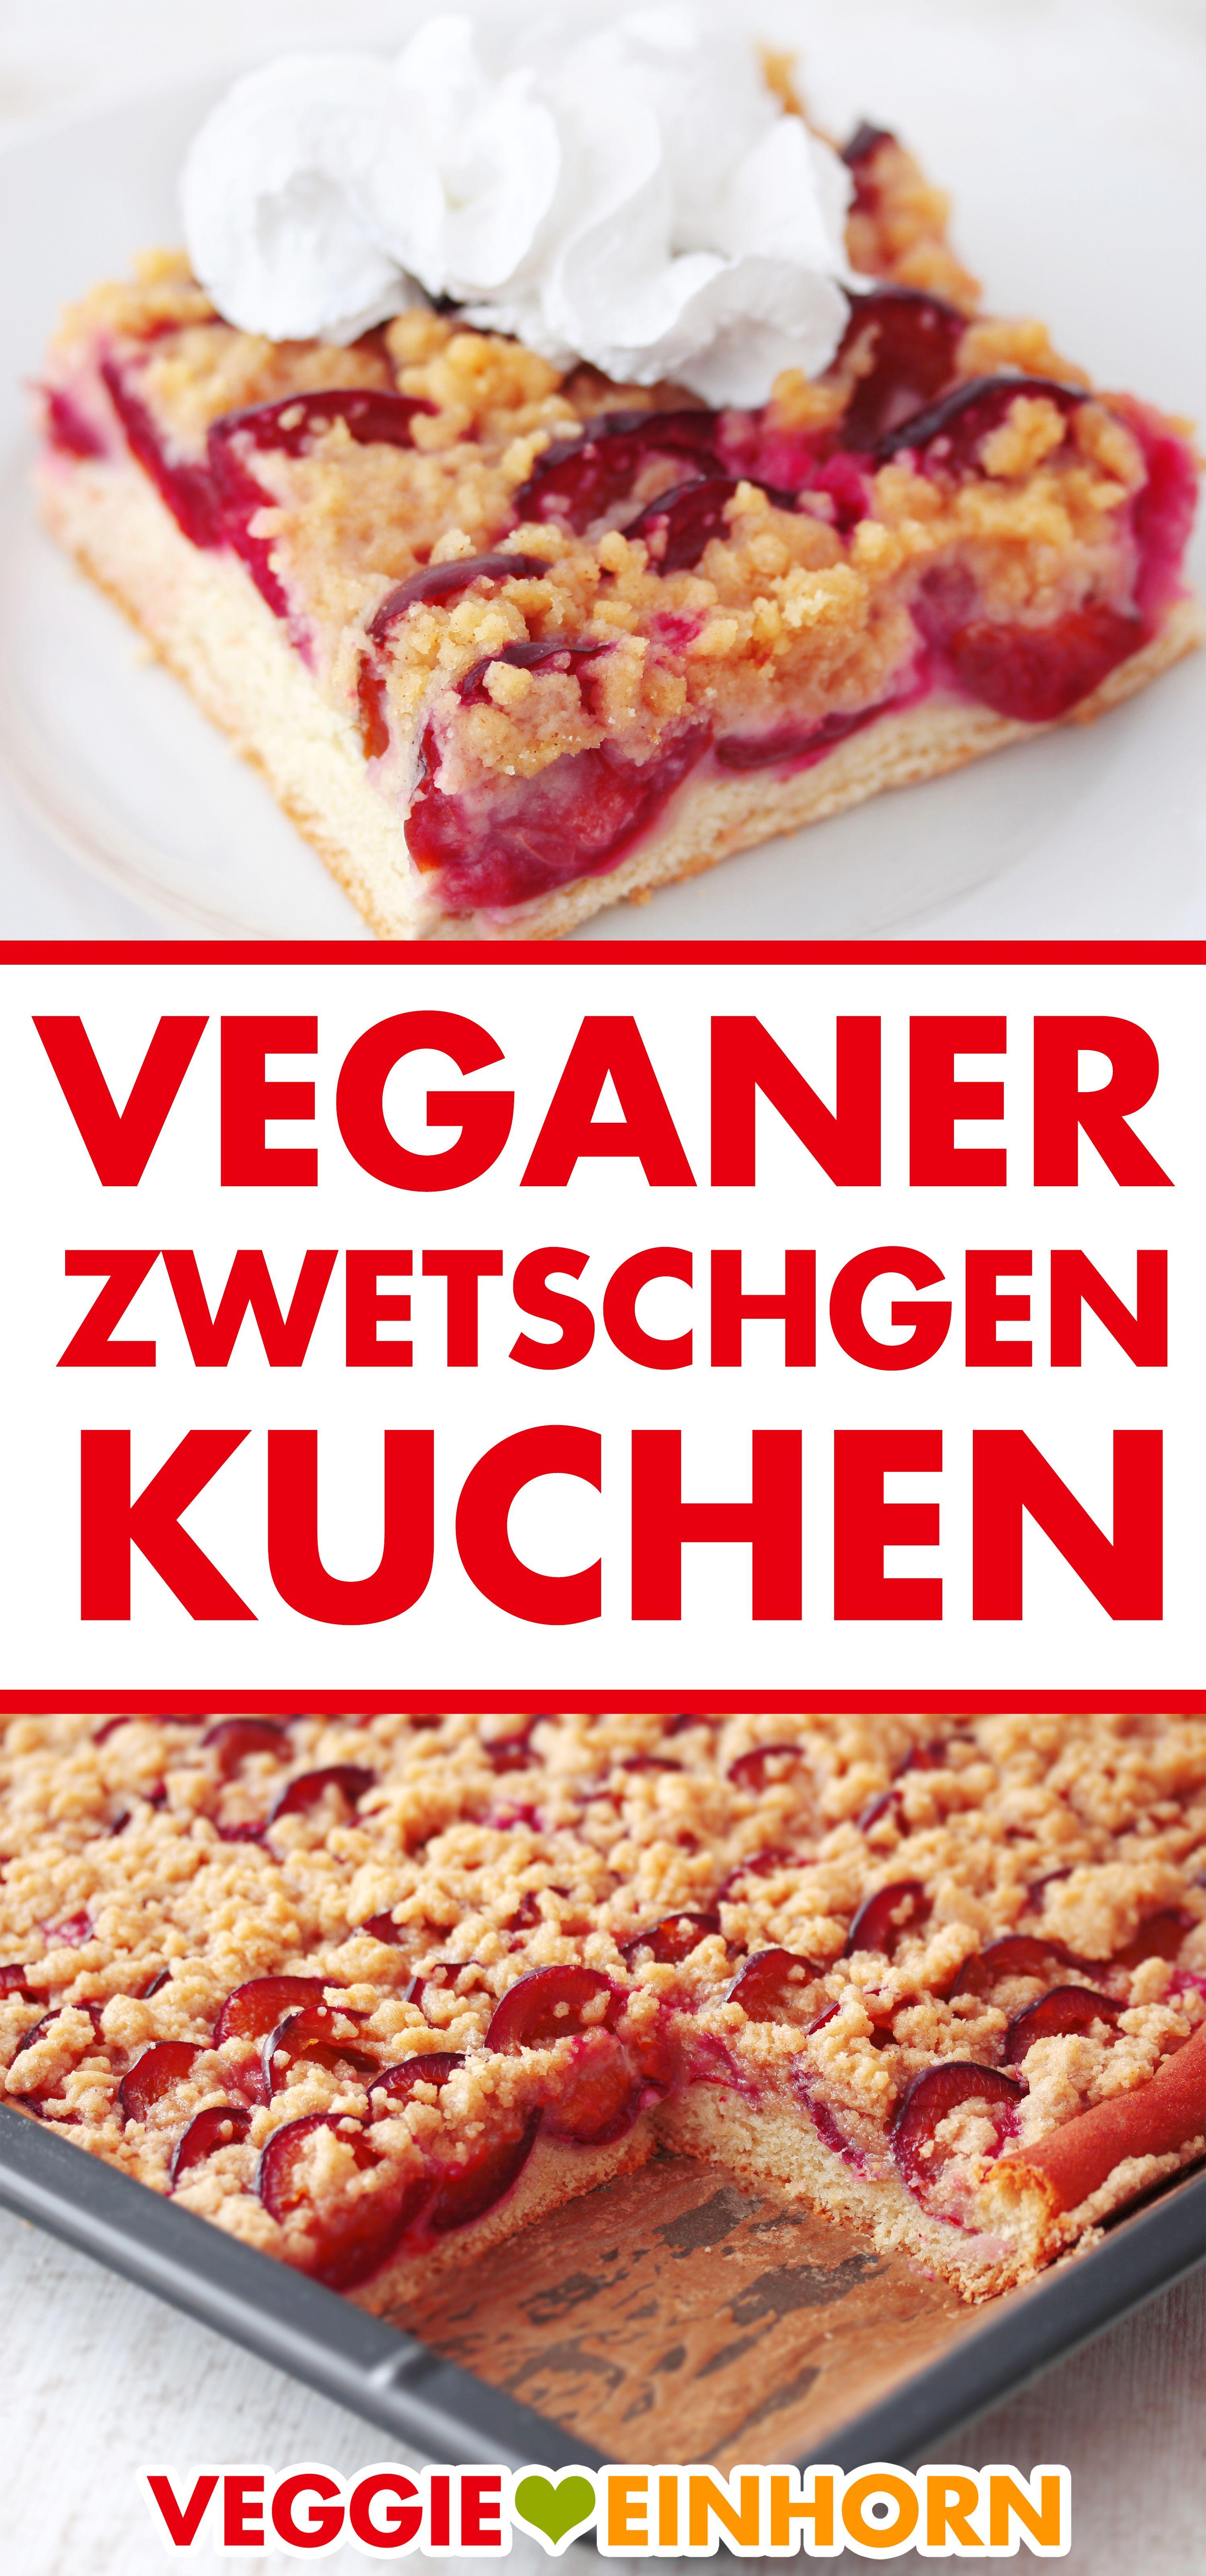 Saftiger veganer Zwetschgenkuchen vom Blech ᐅᐅᐅ Kuchen backen im Herbst ᐅ